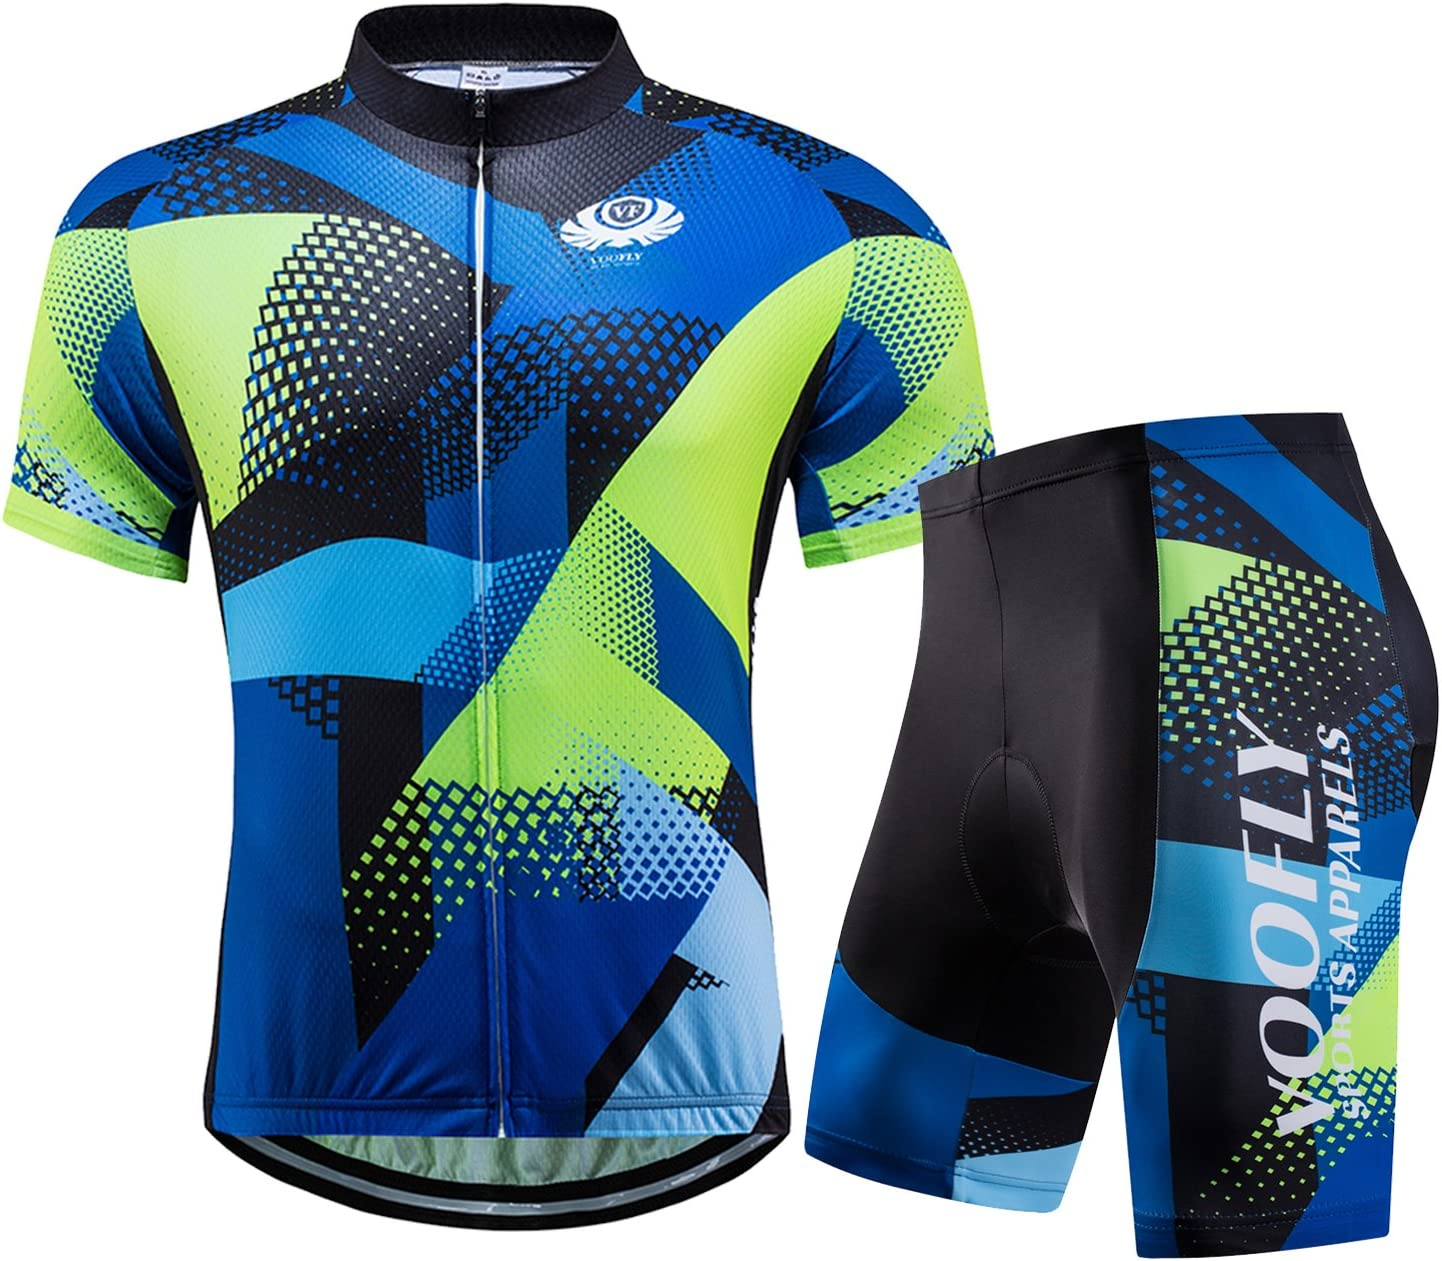 voofly Men's Cycling Jersey Set Men Short Sleeve Compression Bike Shorts Gel Padded Biking Clothing : Clothing